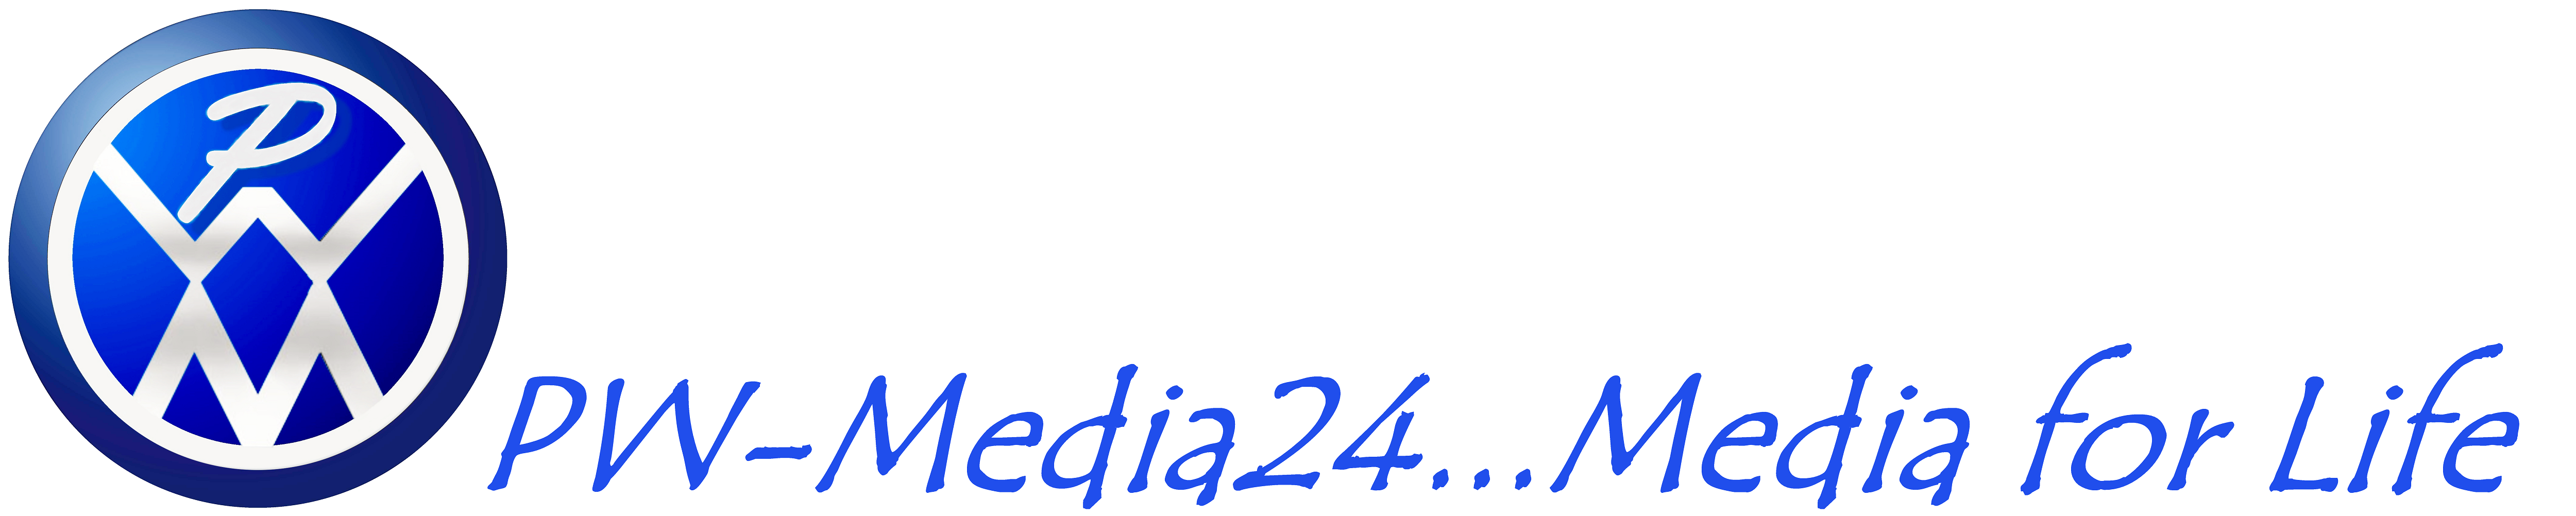 Digistore24 PW-Media24